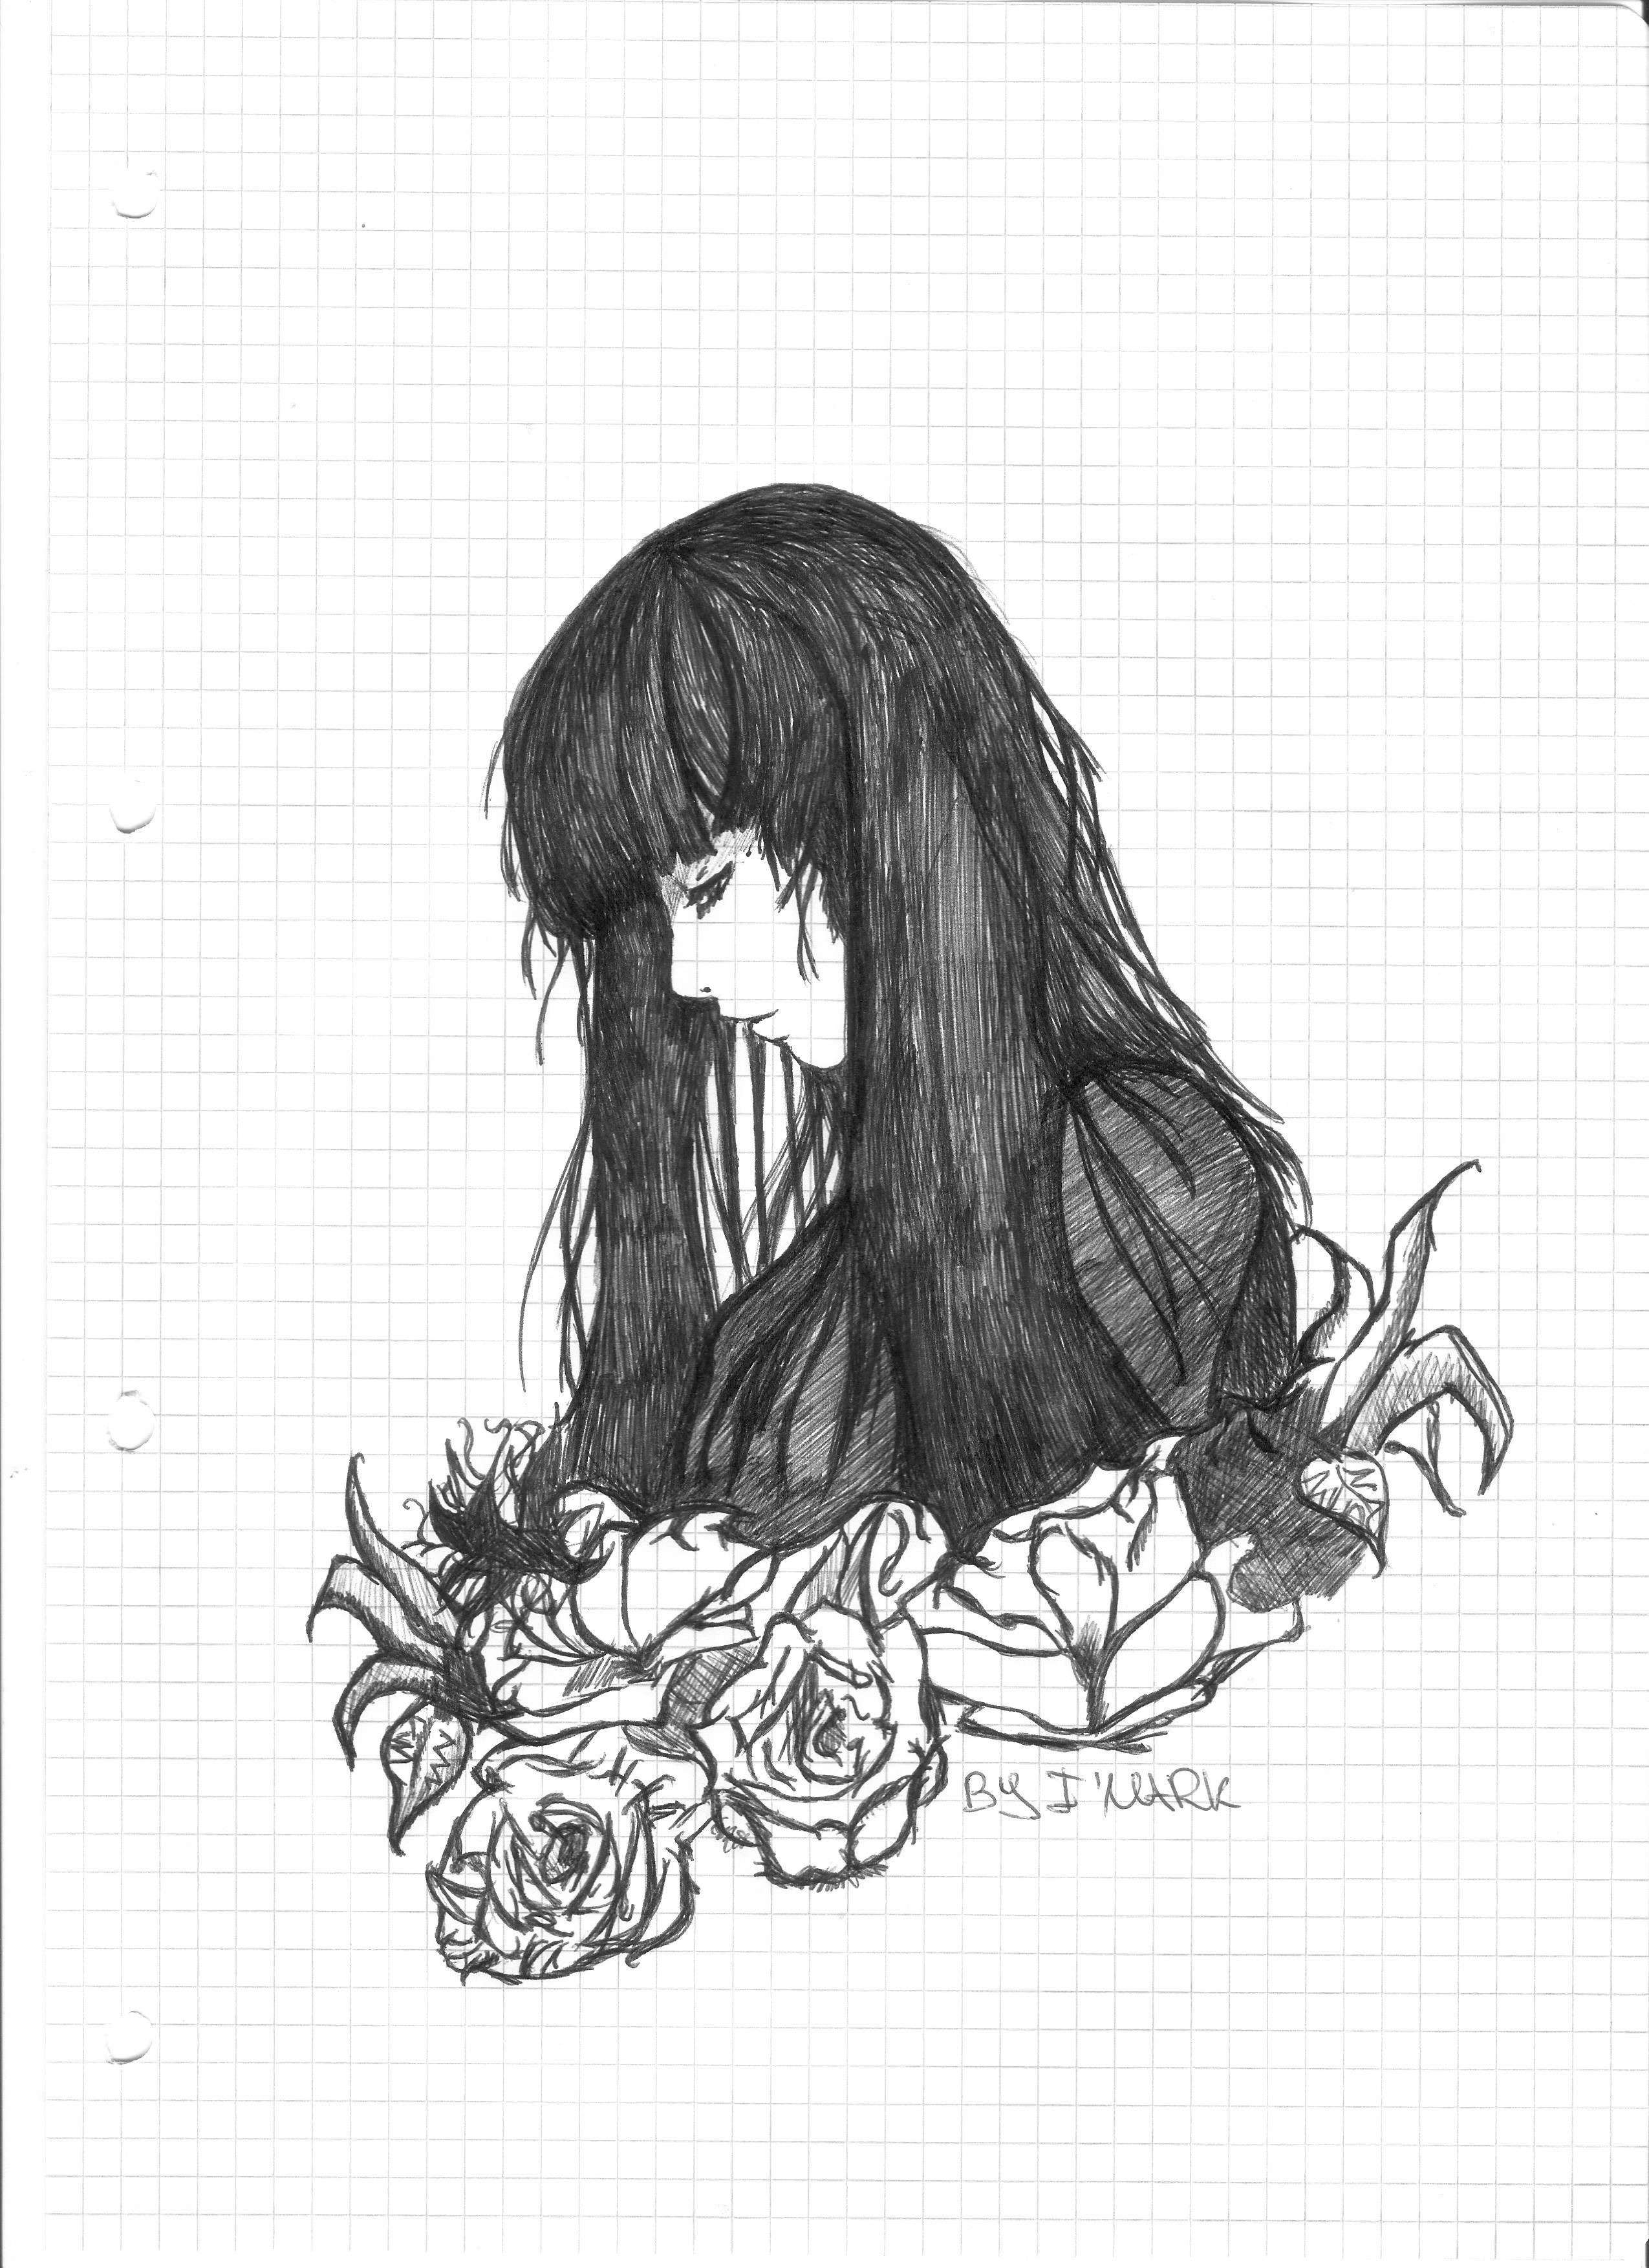 Girl sad cry by markth23 on deviantart